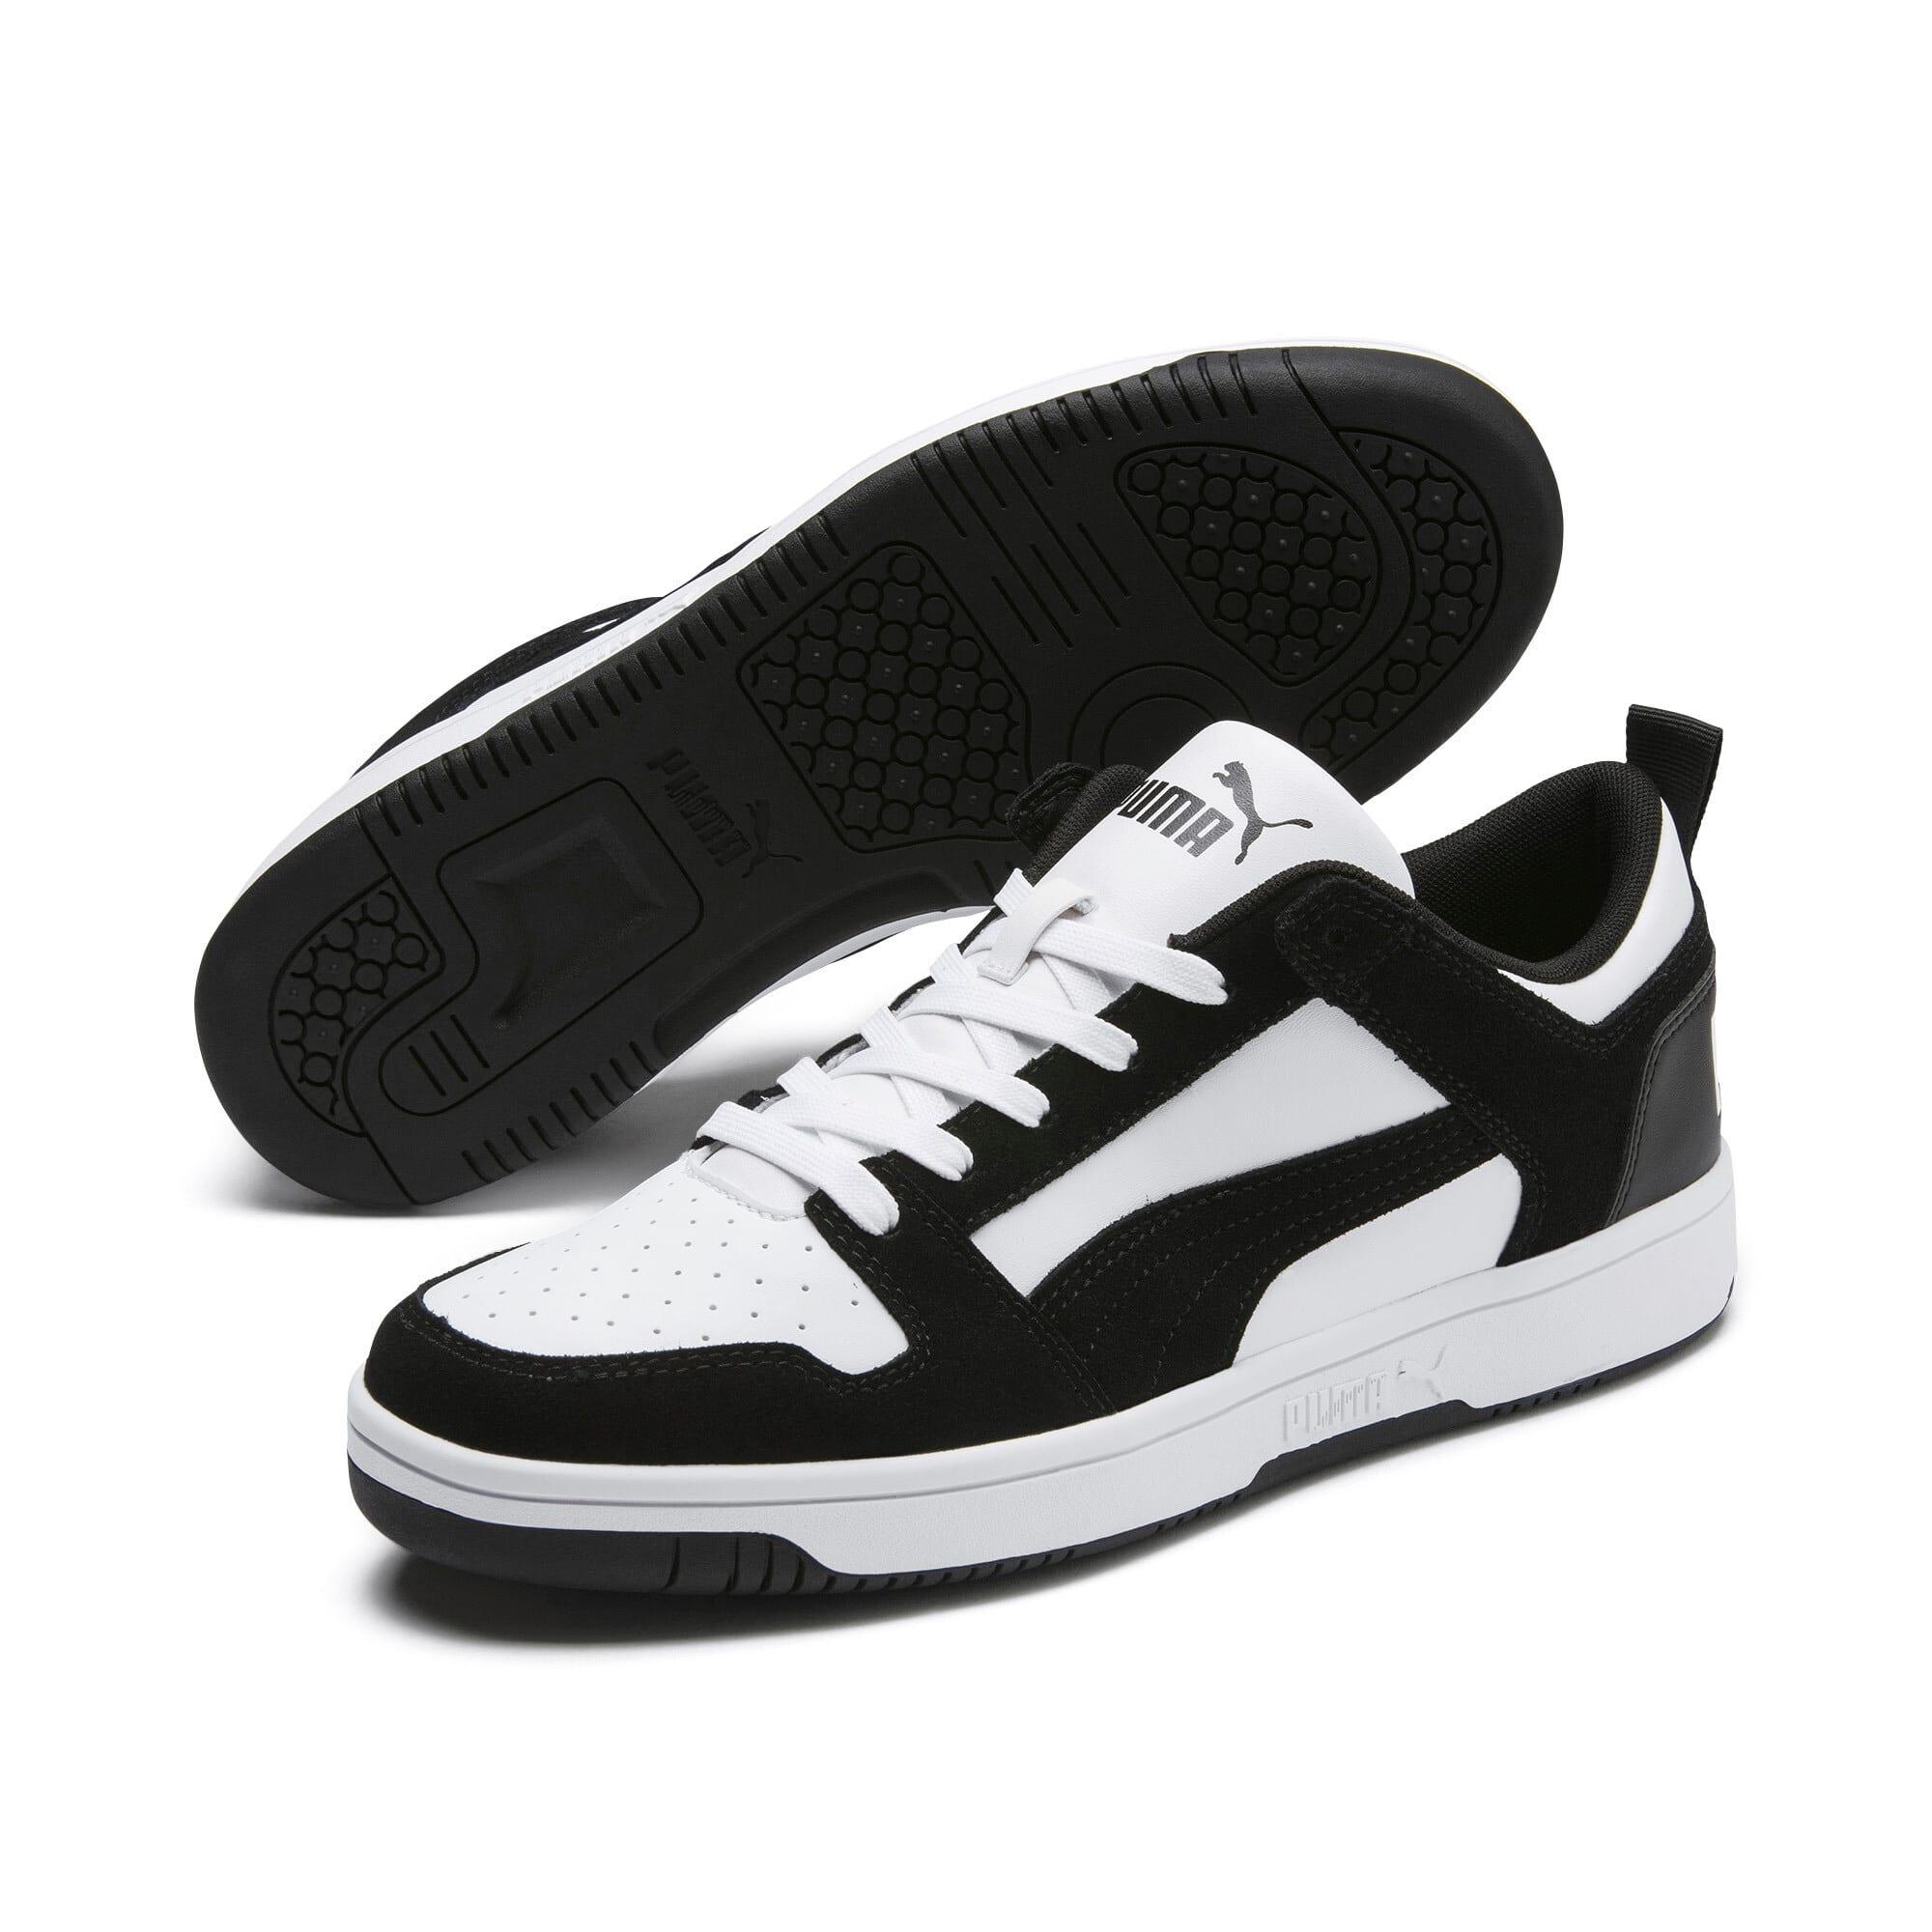 Miniatura 2 de Zapatos deportivos de gamuza PUMA Rebound LayUpLo, Puma Black-Puma White, mediano